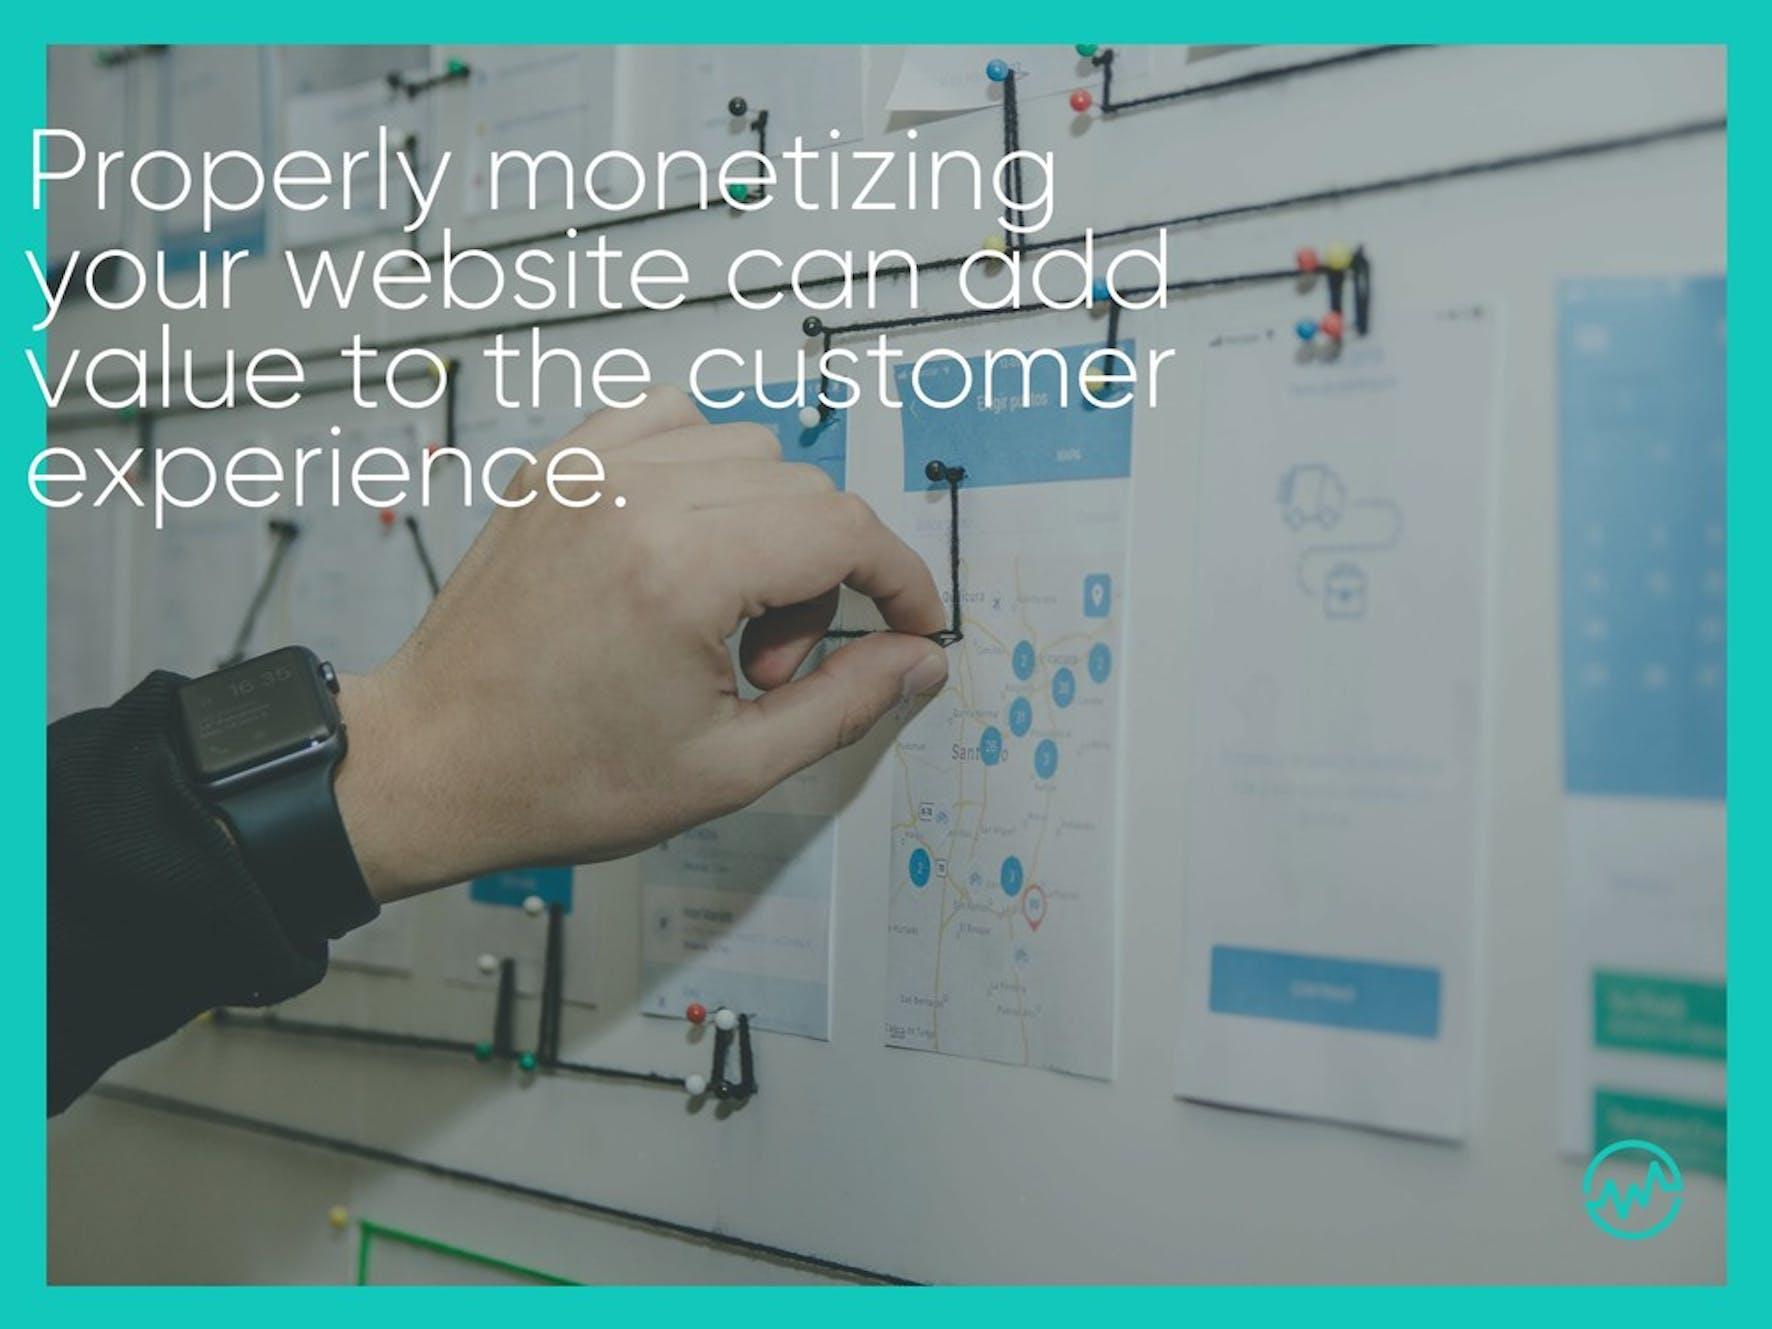 An entrepreneur planning a strategy to monetize a website